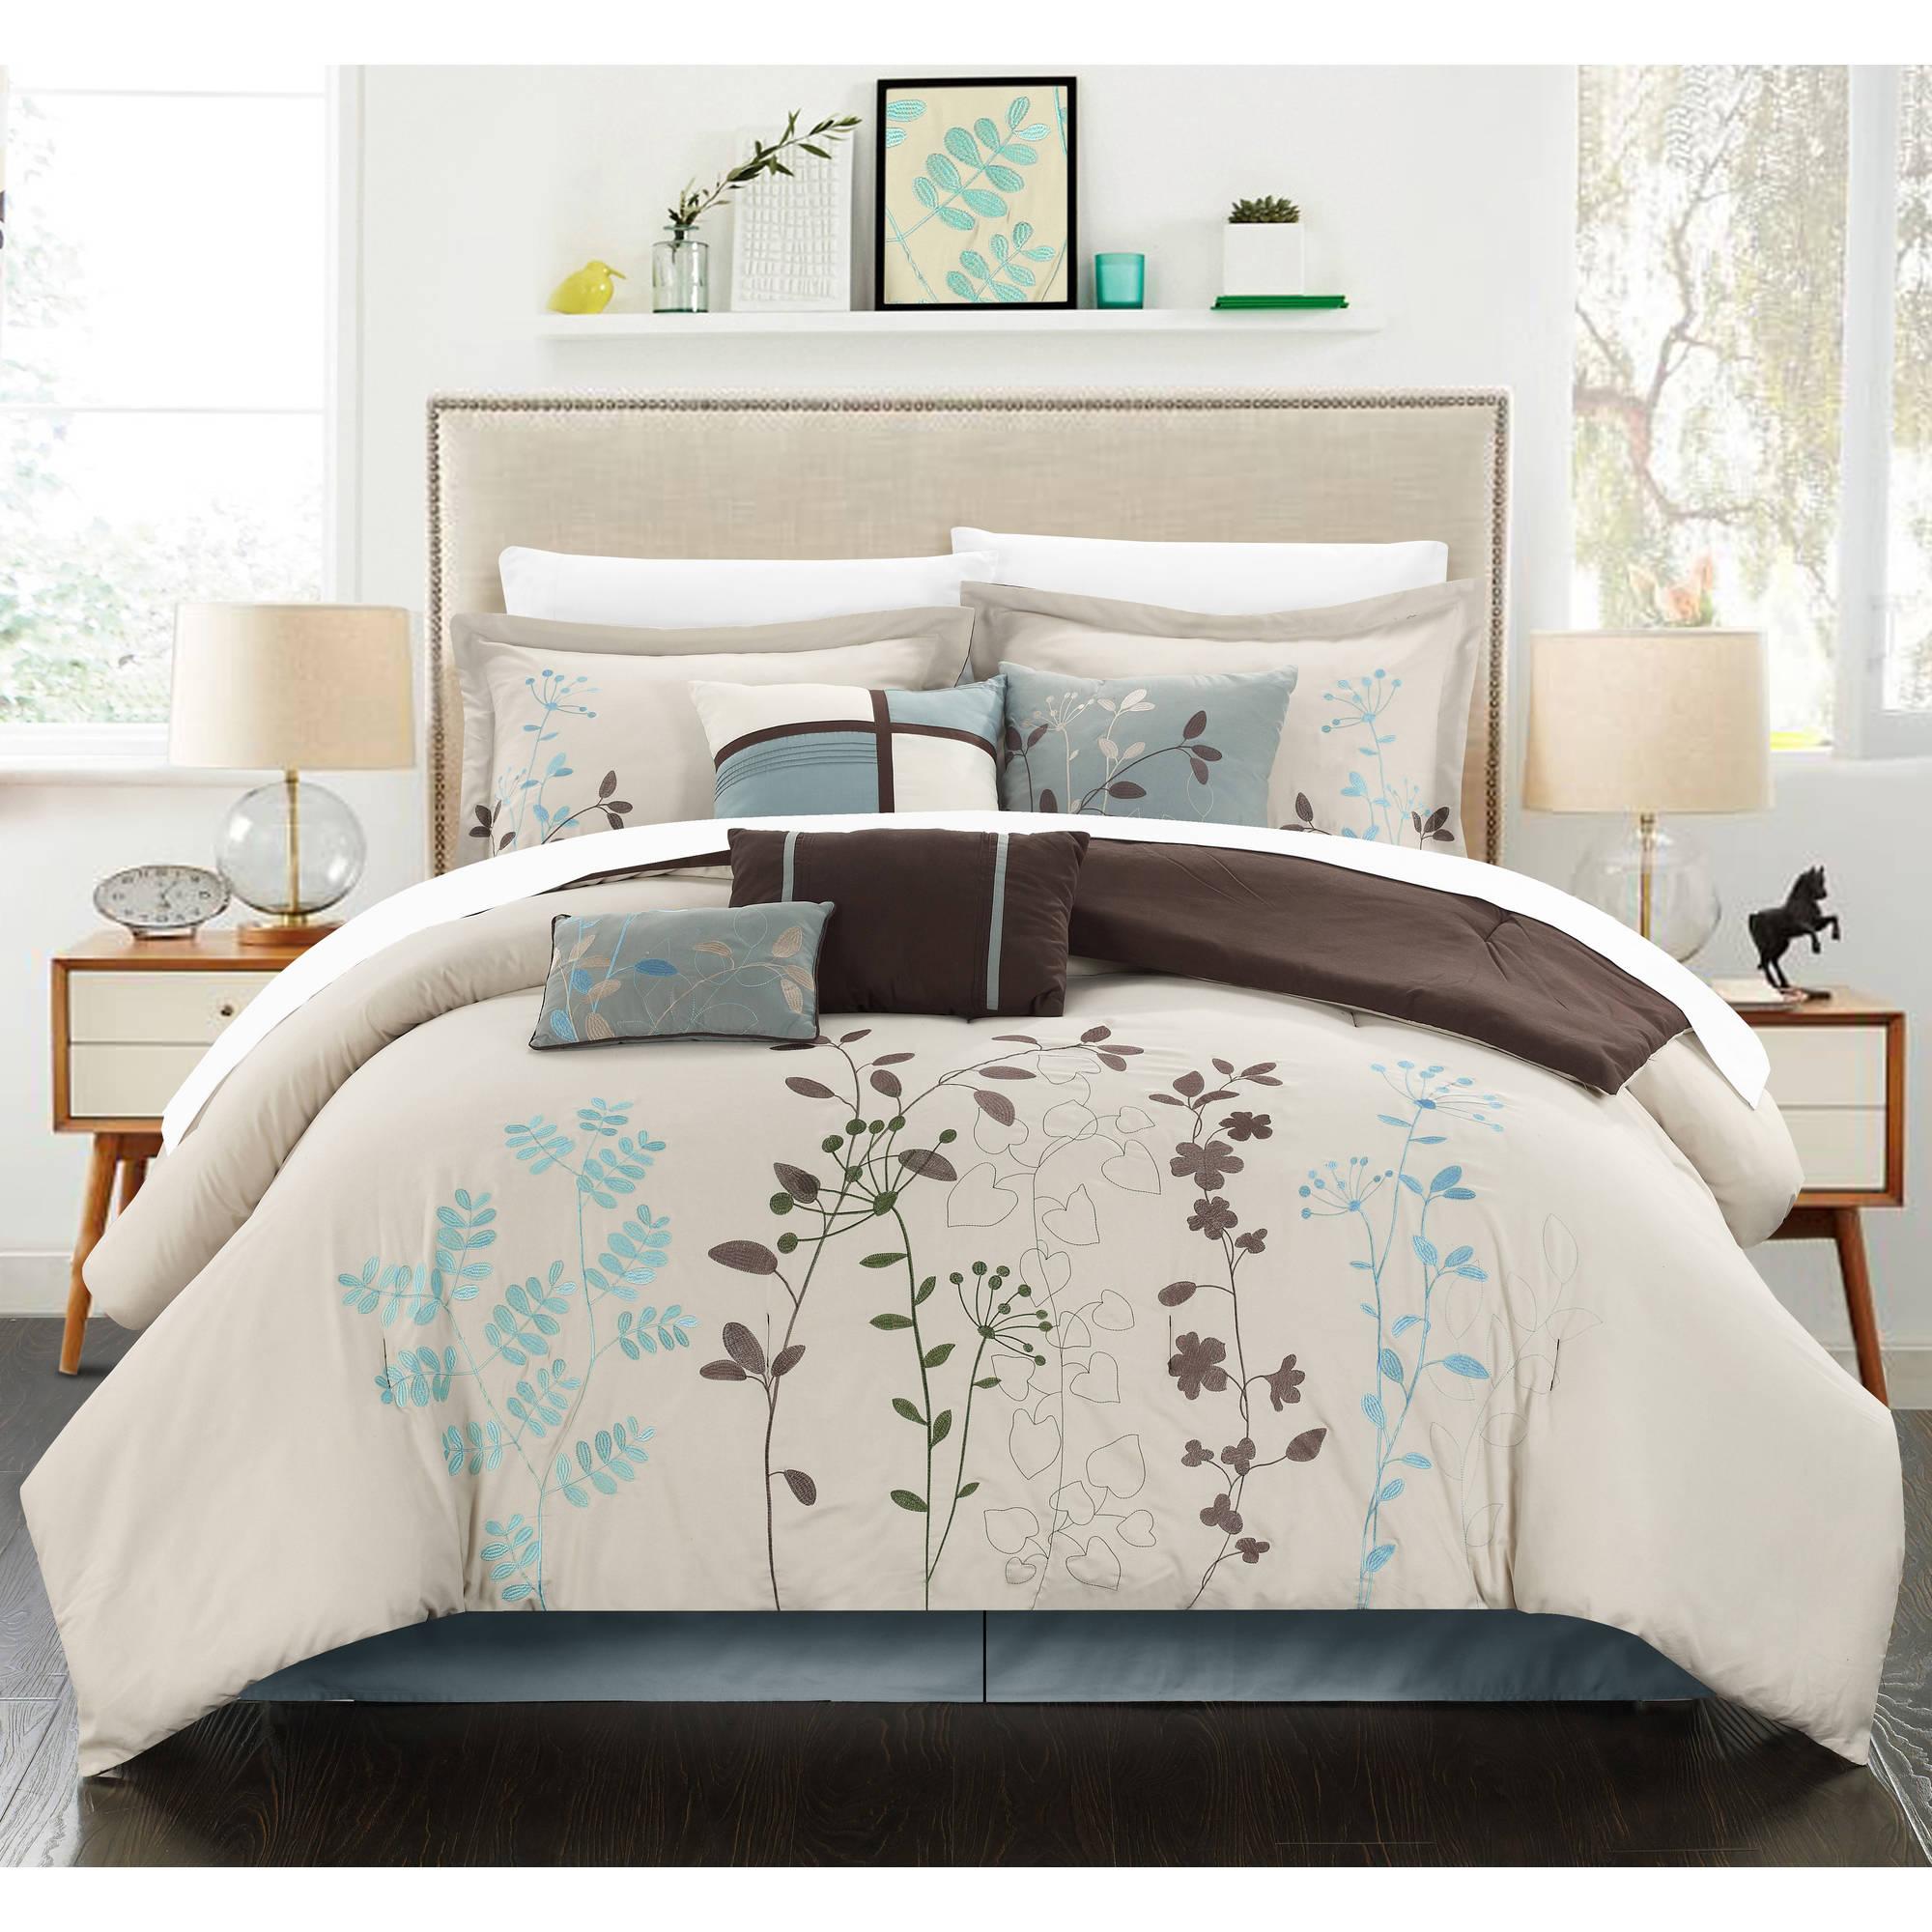 Fortuno 8-Piece Bedding Comforter Set